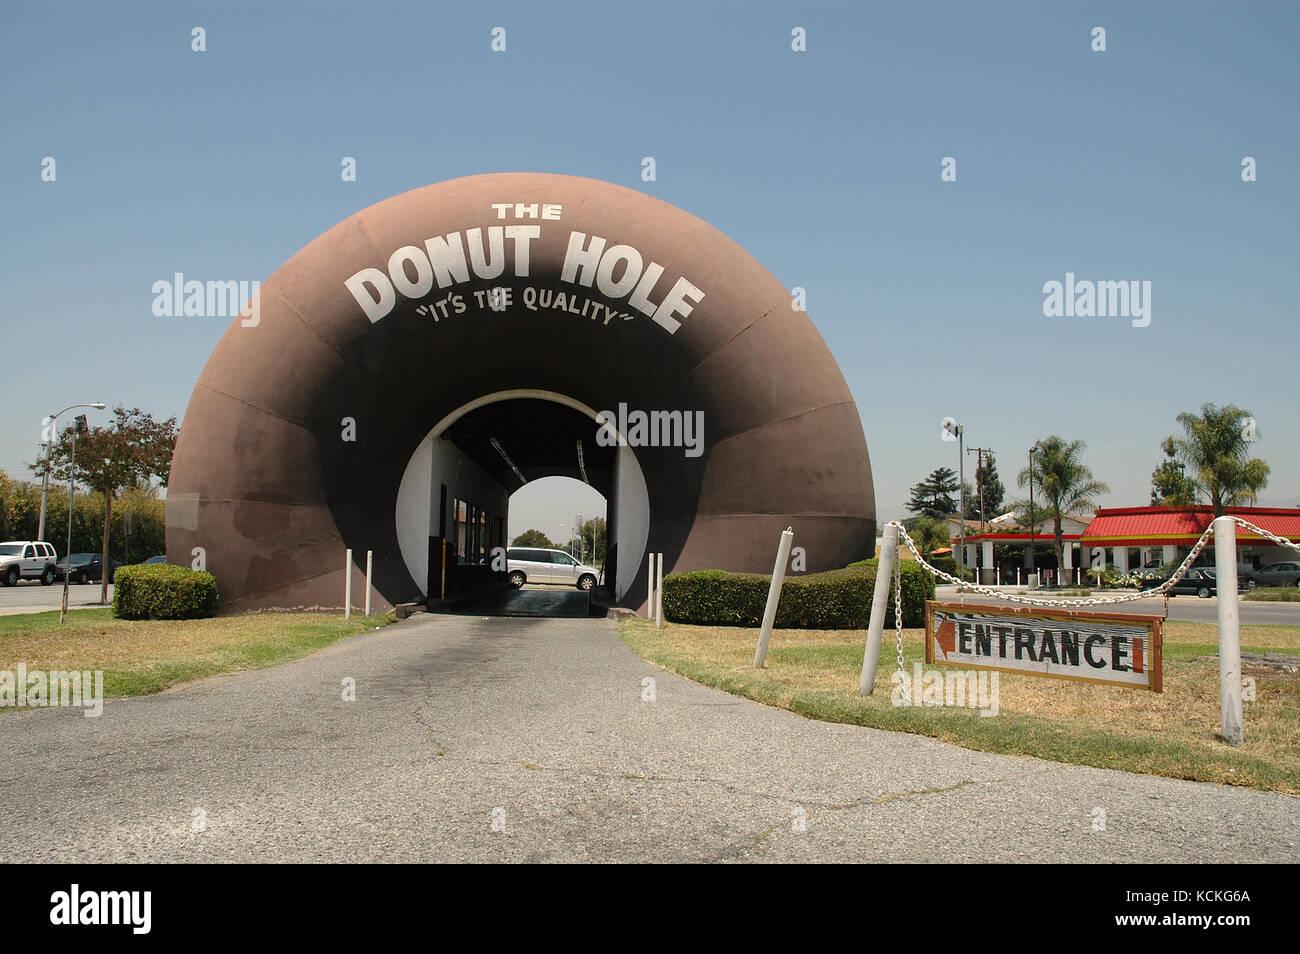 The Donut Hole drive-thru at La Puente, California, USA Stock Photo